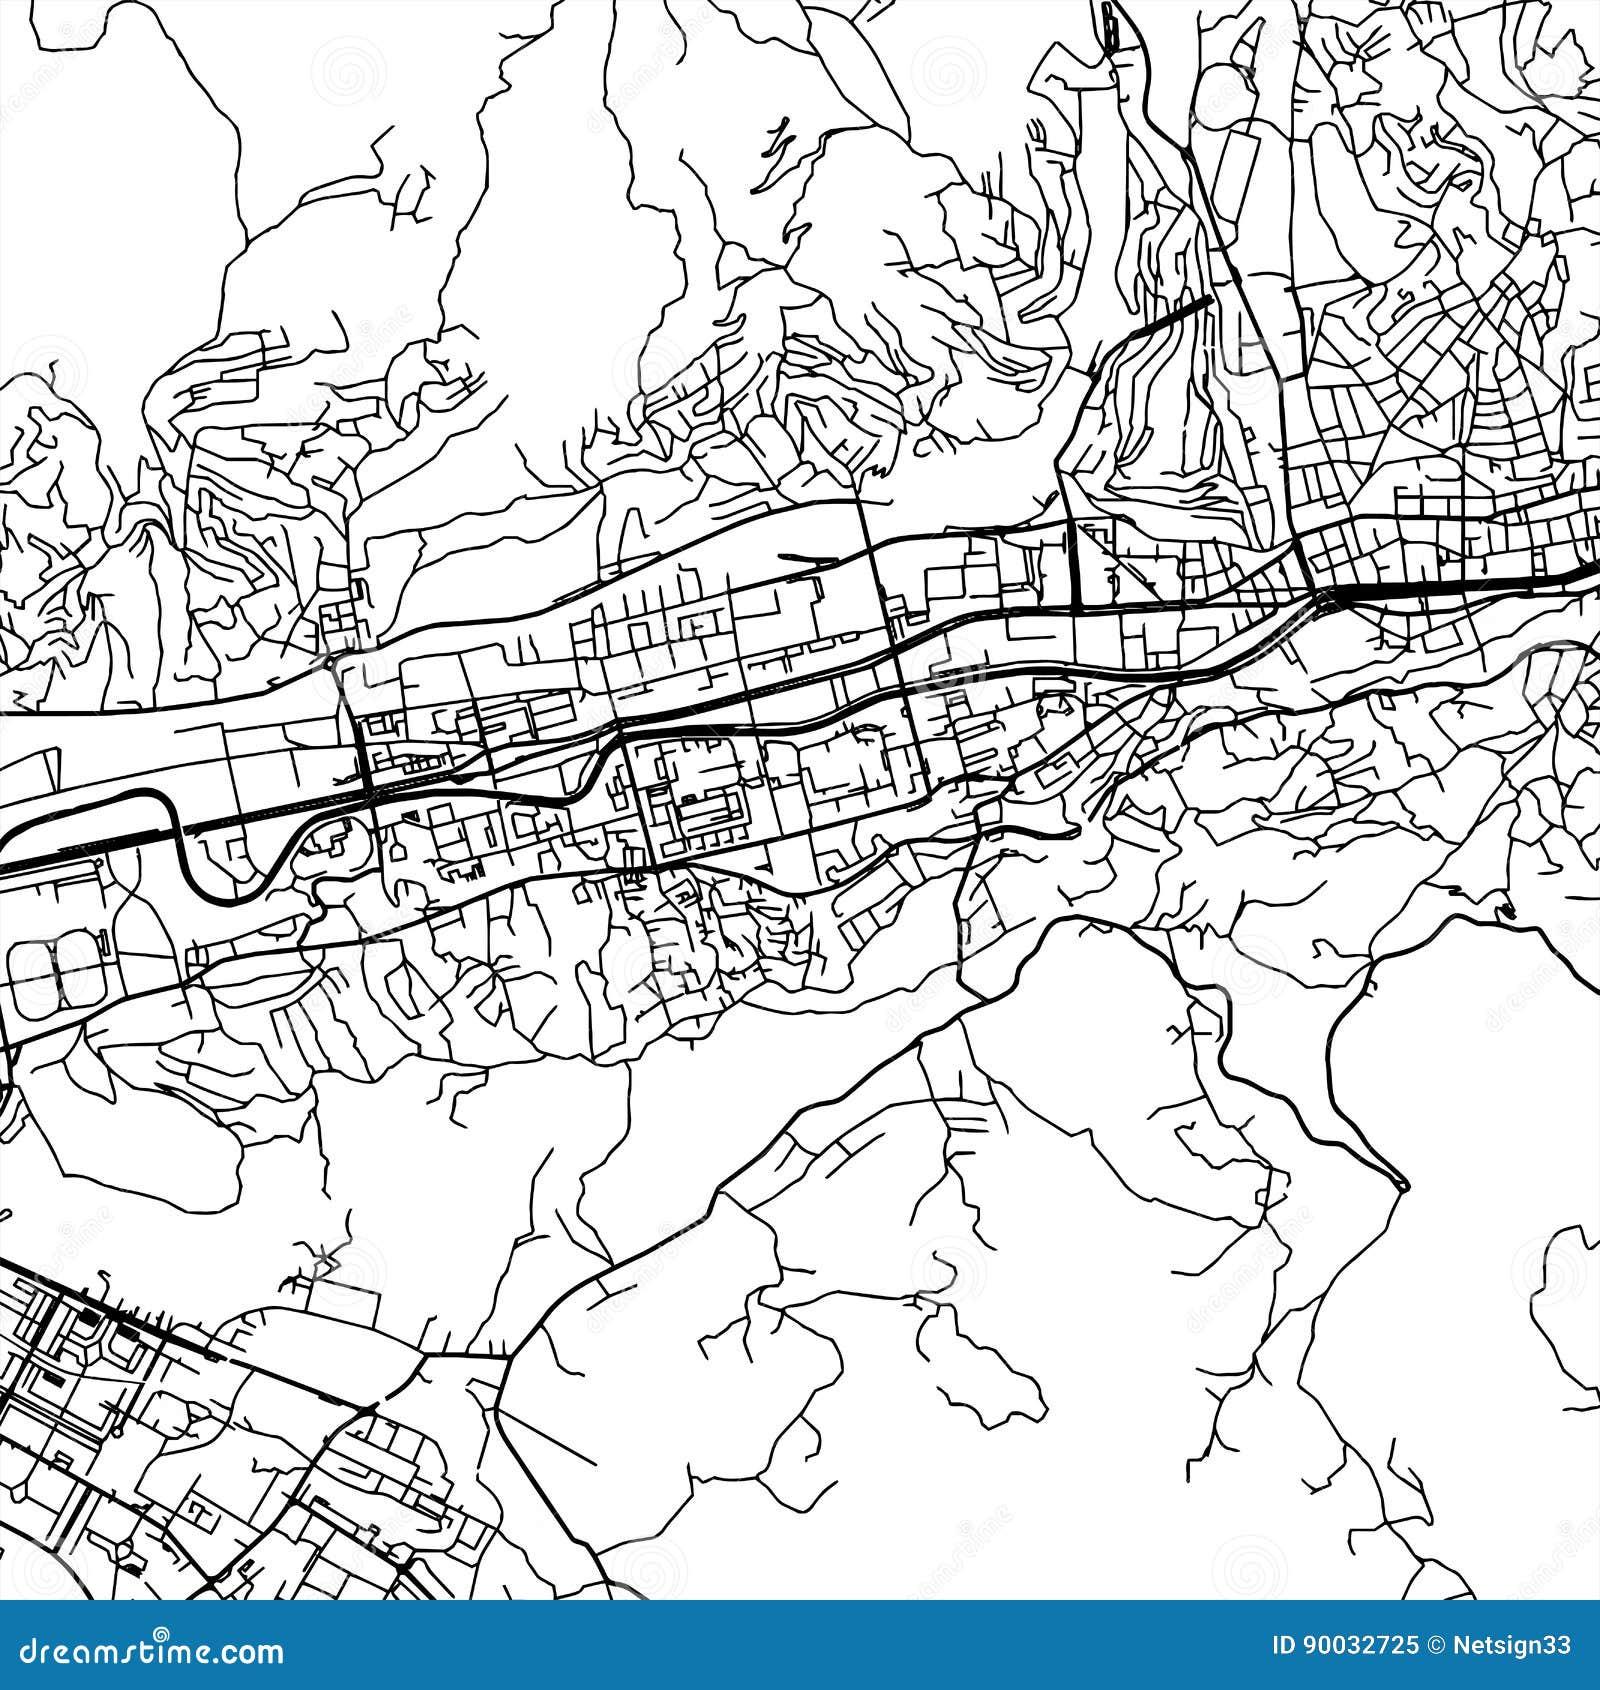 Sarajevo Bosnia And Herzegovina Vector Map Stock Vector ... on istanbul map, gibraltar on map, budapest map, bosnia map, belgrade map, vienna map, bosnia and herzegovina, dublin map, serbia map, kosovo map, constantinople map, zagreb map, croatia map, balkans map, minsk map, gavrilo princip, siege of sarajevo, kiev map, yugoslavia map, skopje map, the hague map, tirana map, riga map, bosnian war,